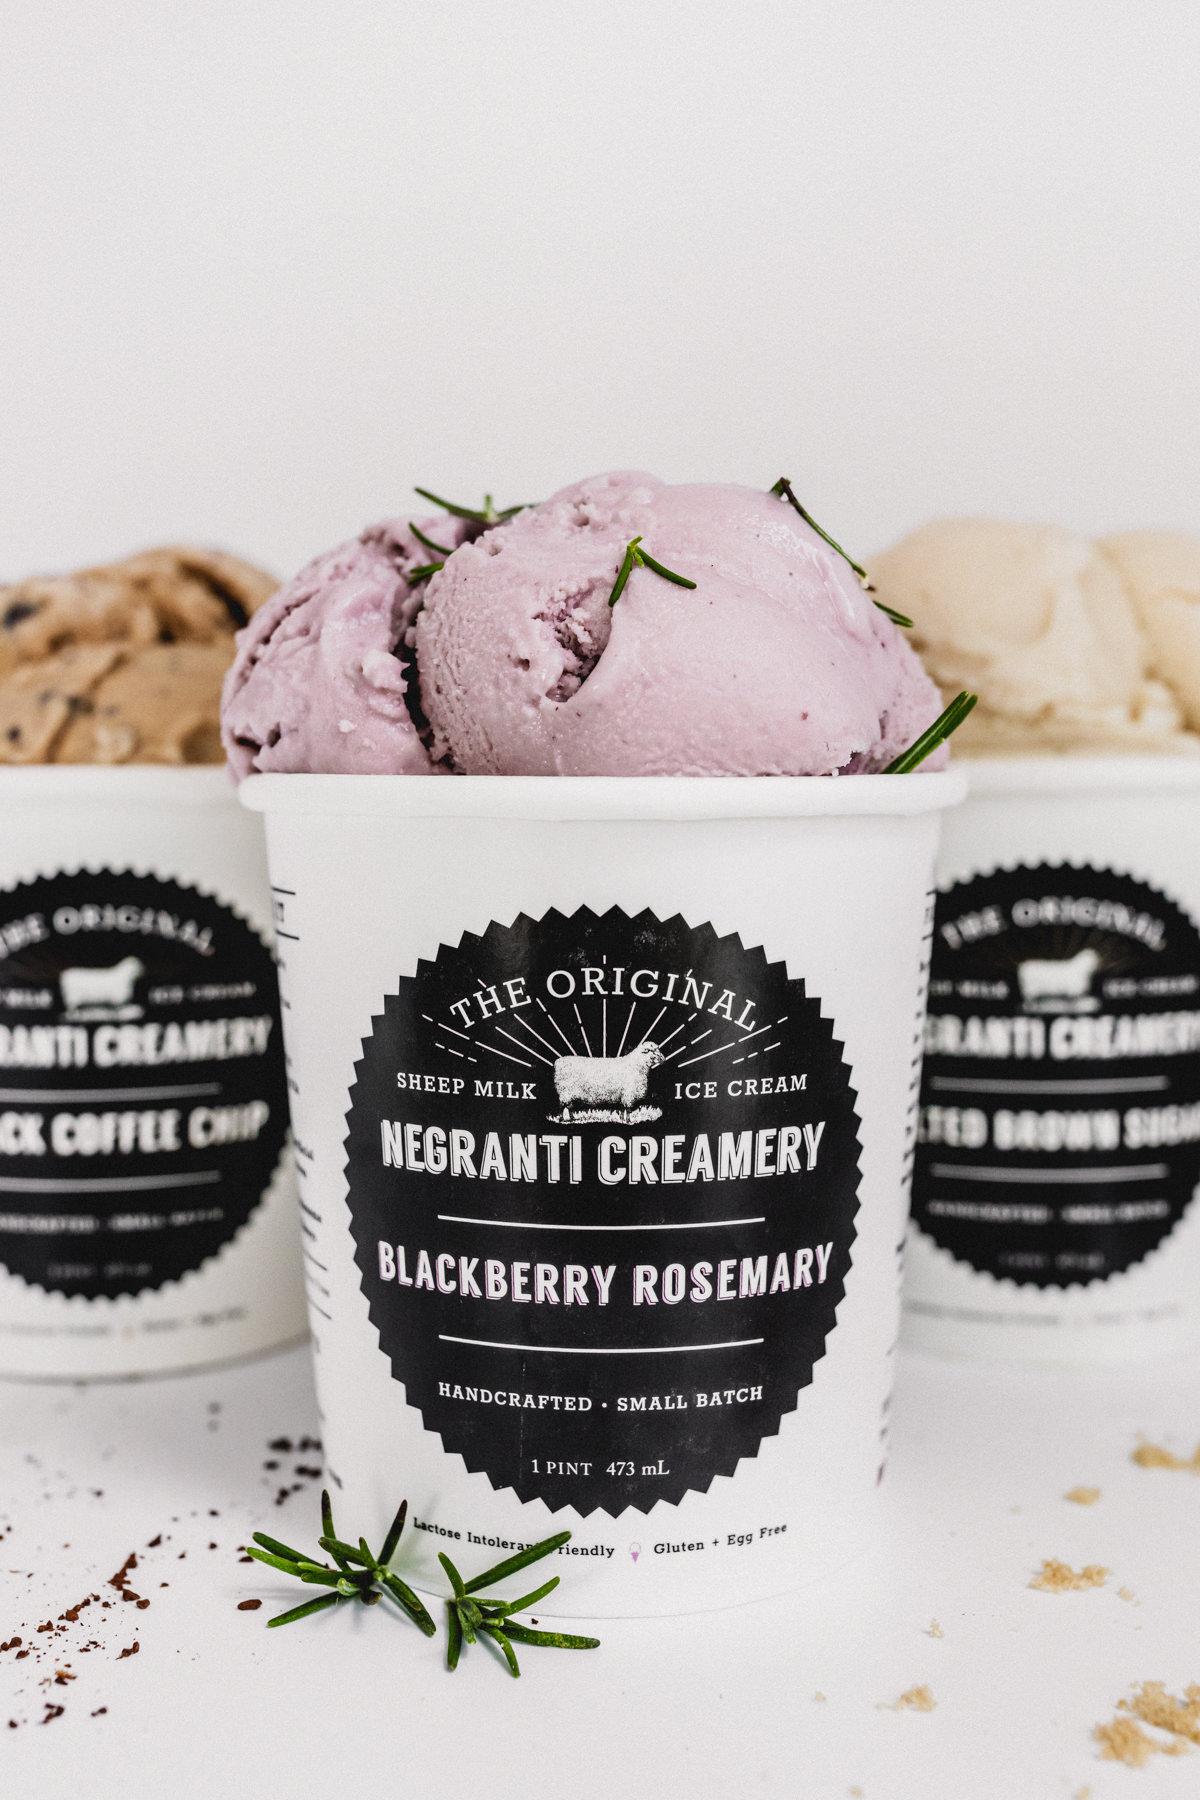 Product-Photography-Negranti-Creamery-Paso-Robles-California-805-Media-15.jpg